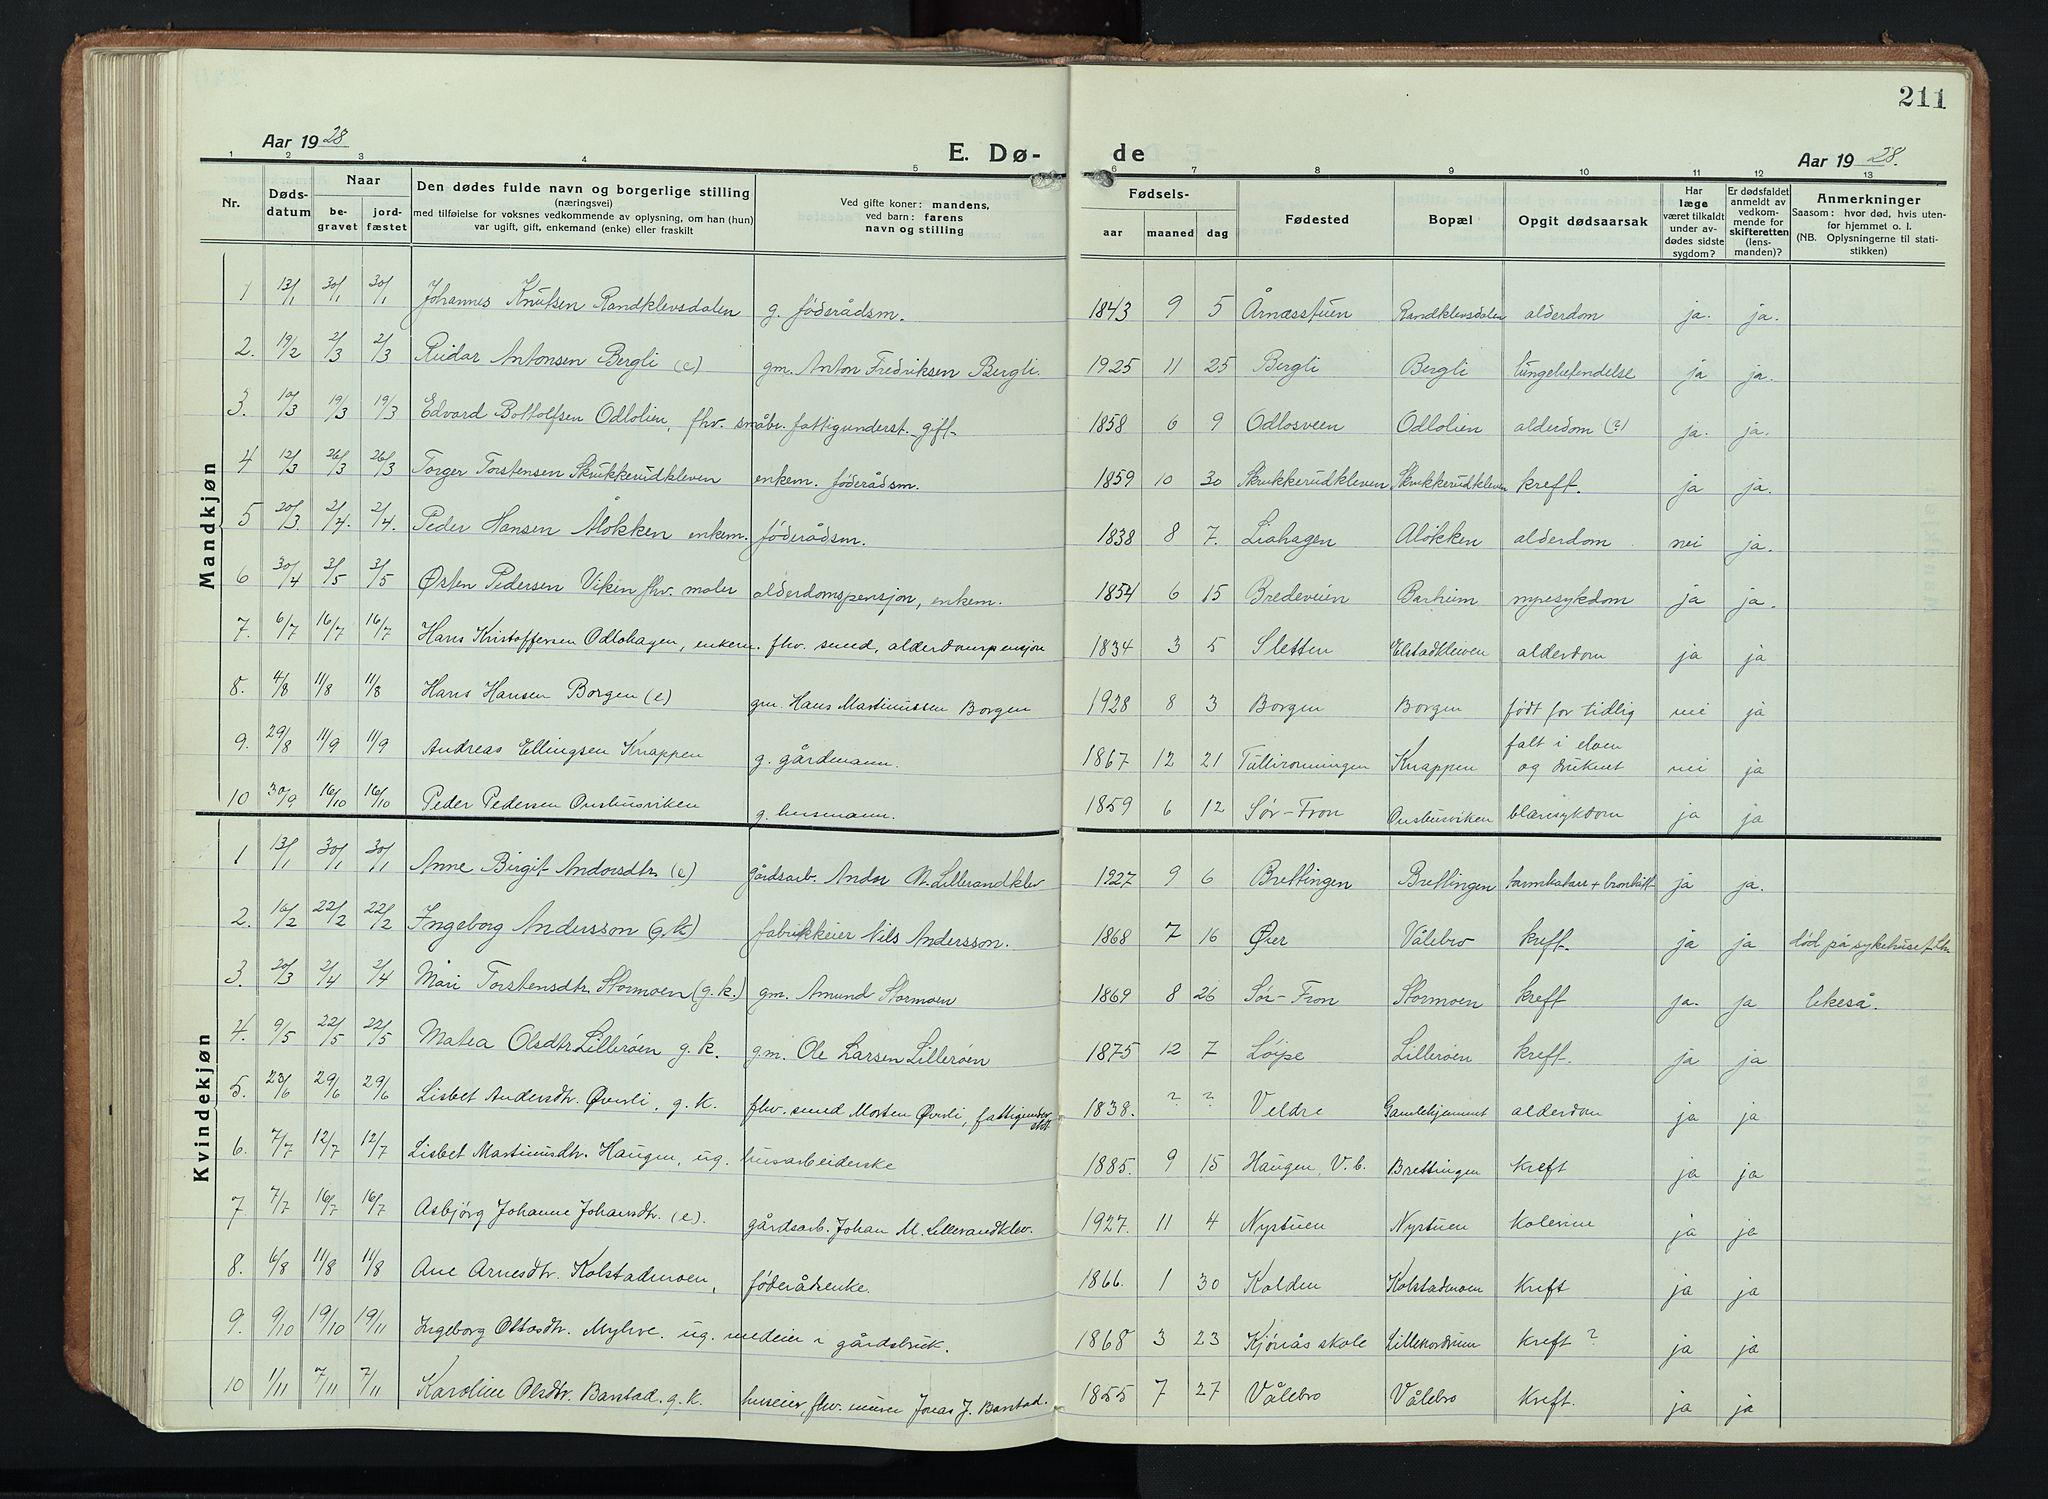 SAH, Ringebu prestekontor, Klokkerbok nr. 11, 1921-1943, s. 211